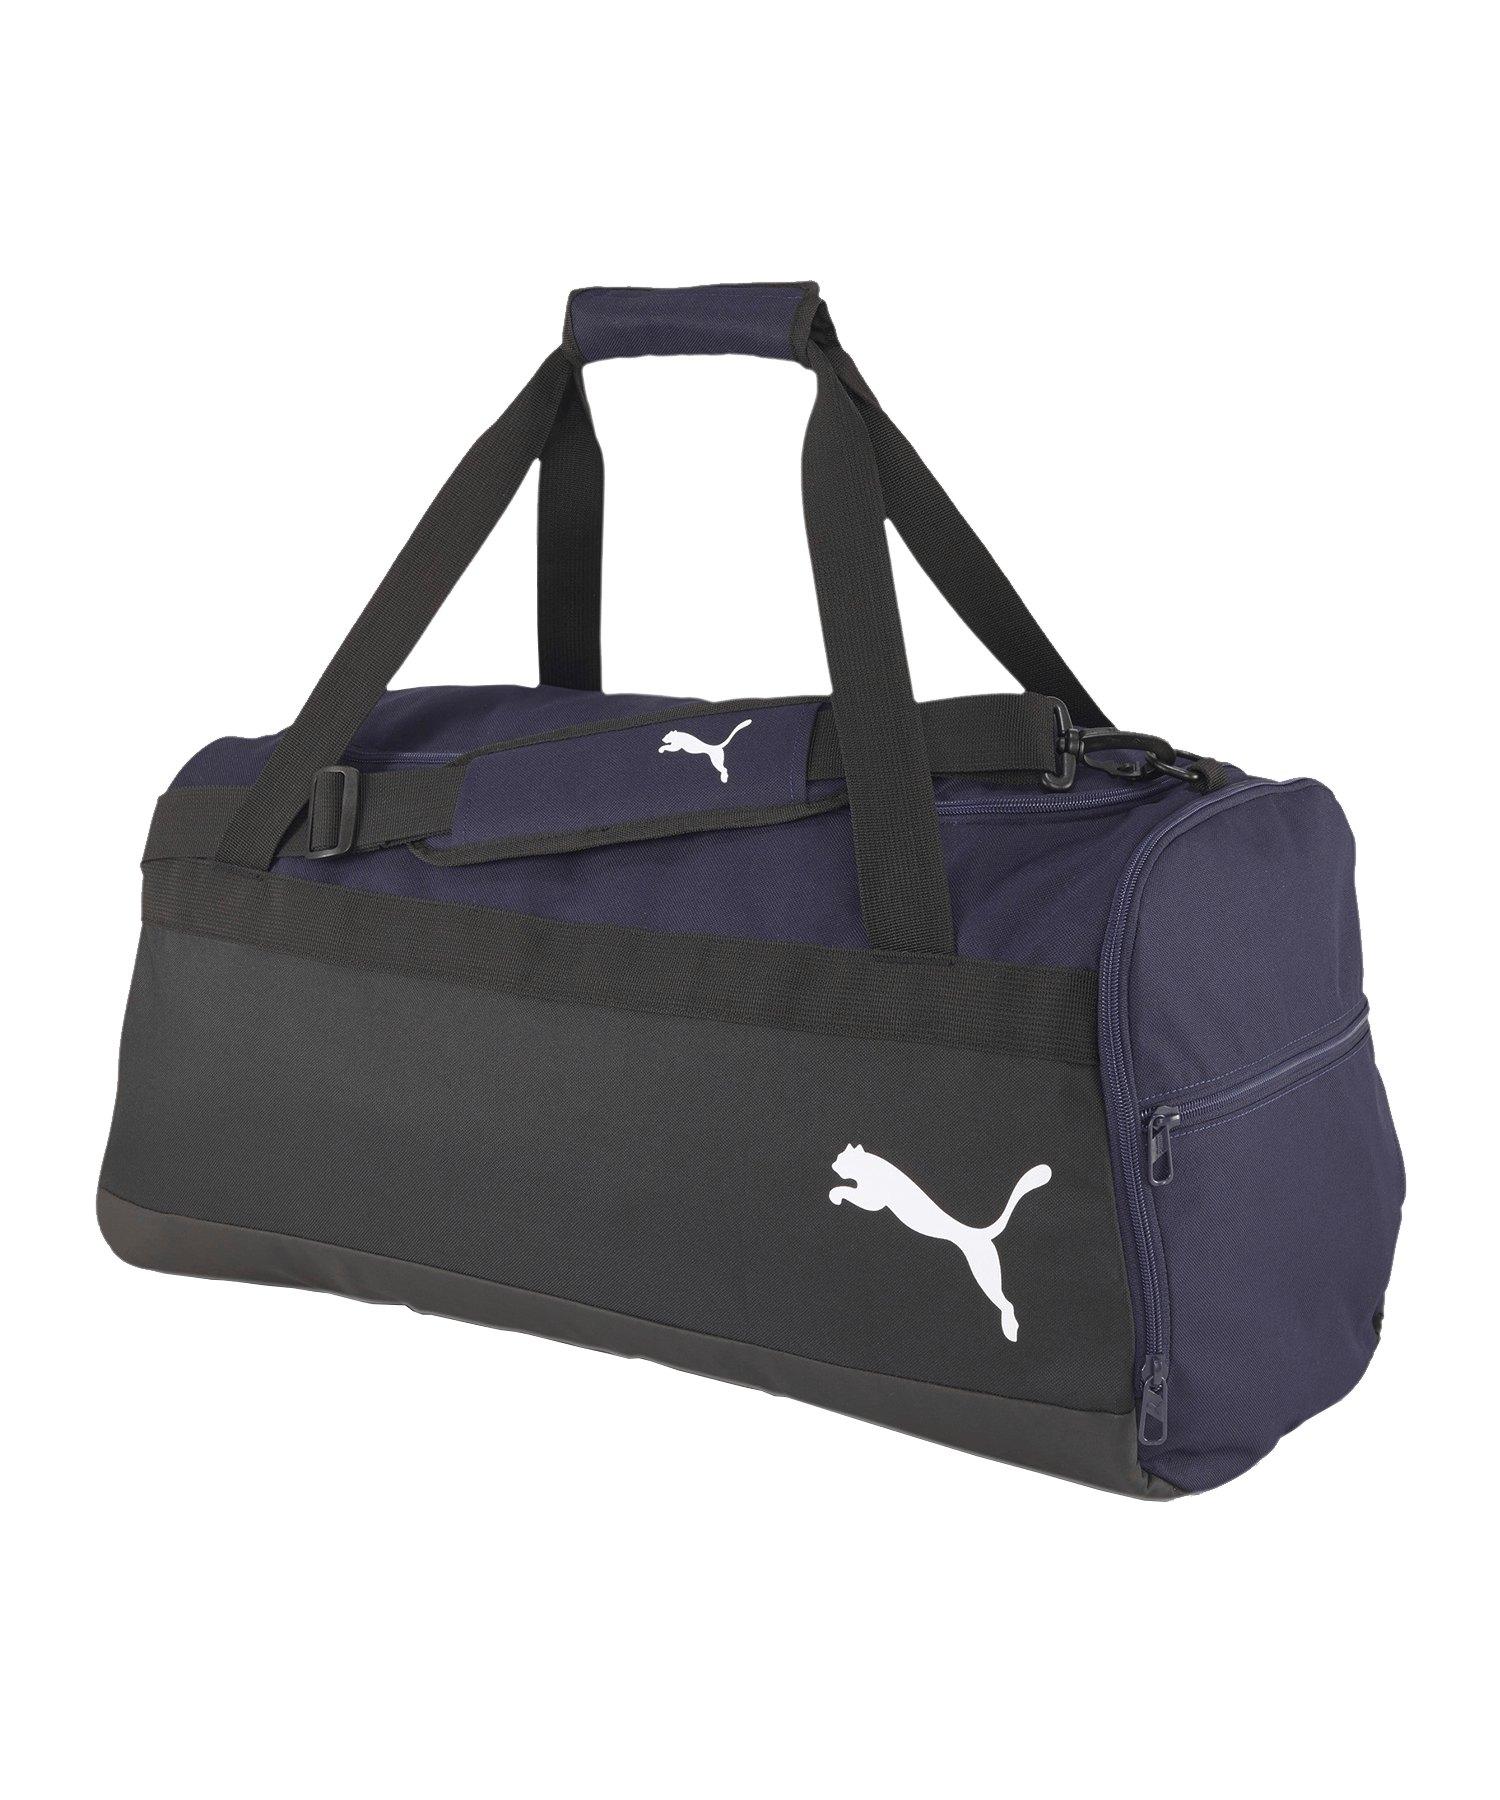 PUMA teamGOAL 23 Teambag Sporttasche Gr. M F06 - schwarz